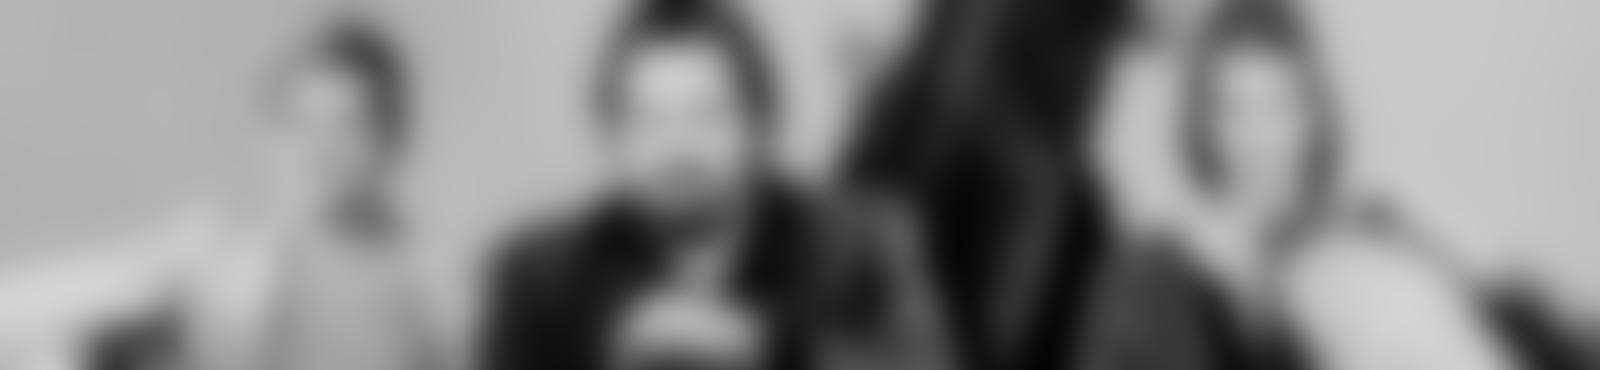 Blurred 238329c4 5a04 4755 b09e 1ef779f0393a